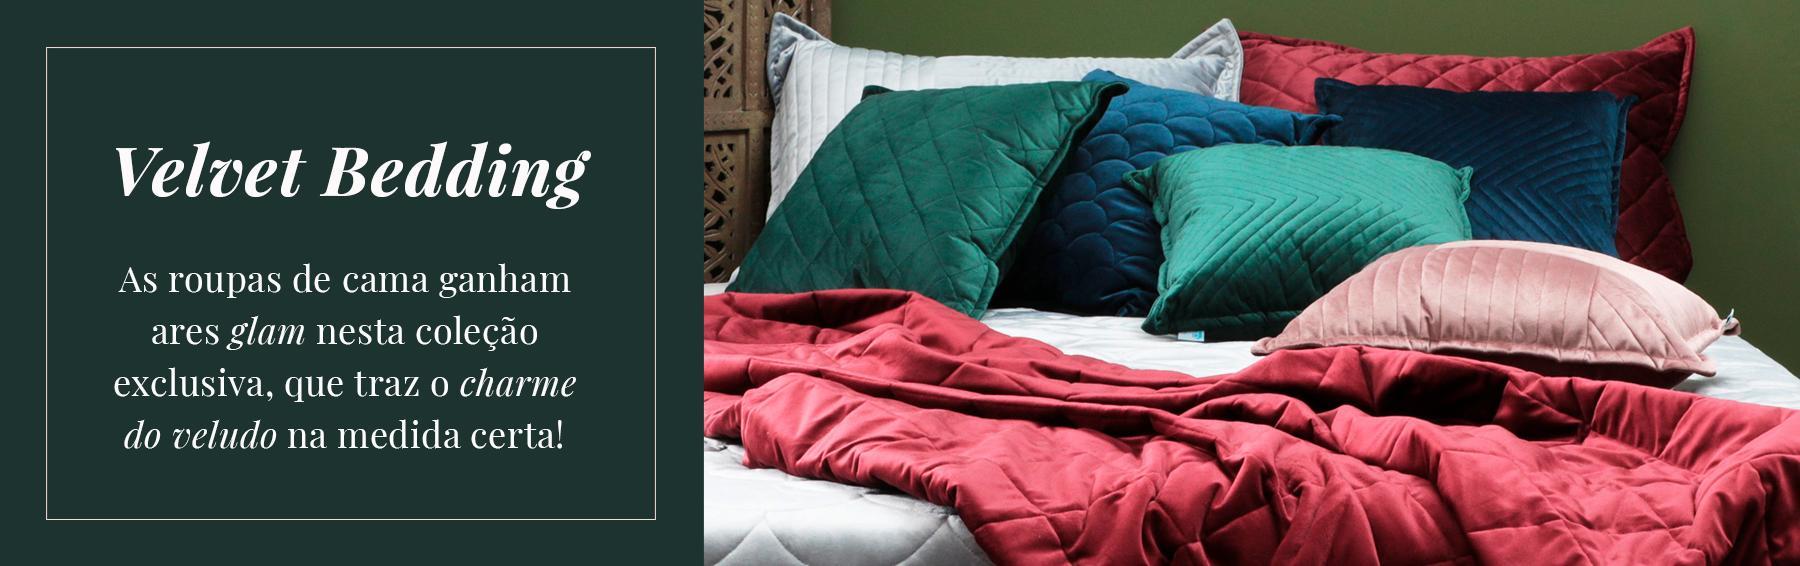 <Velvet Bedding | WestwingNow>